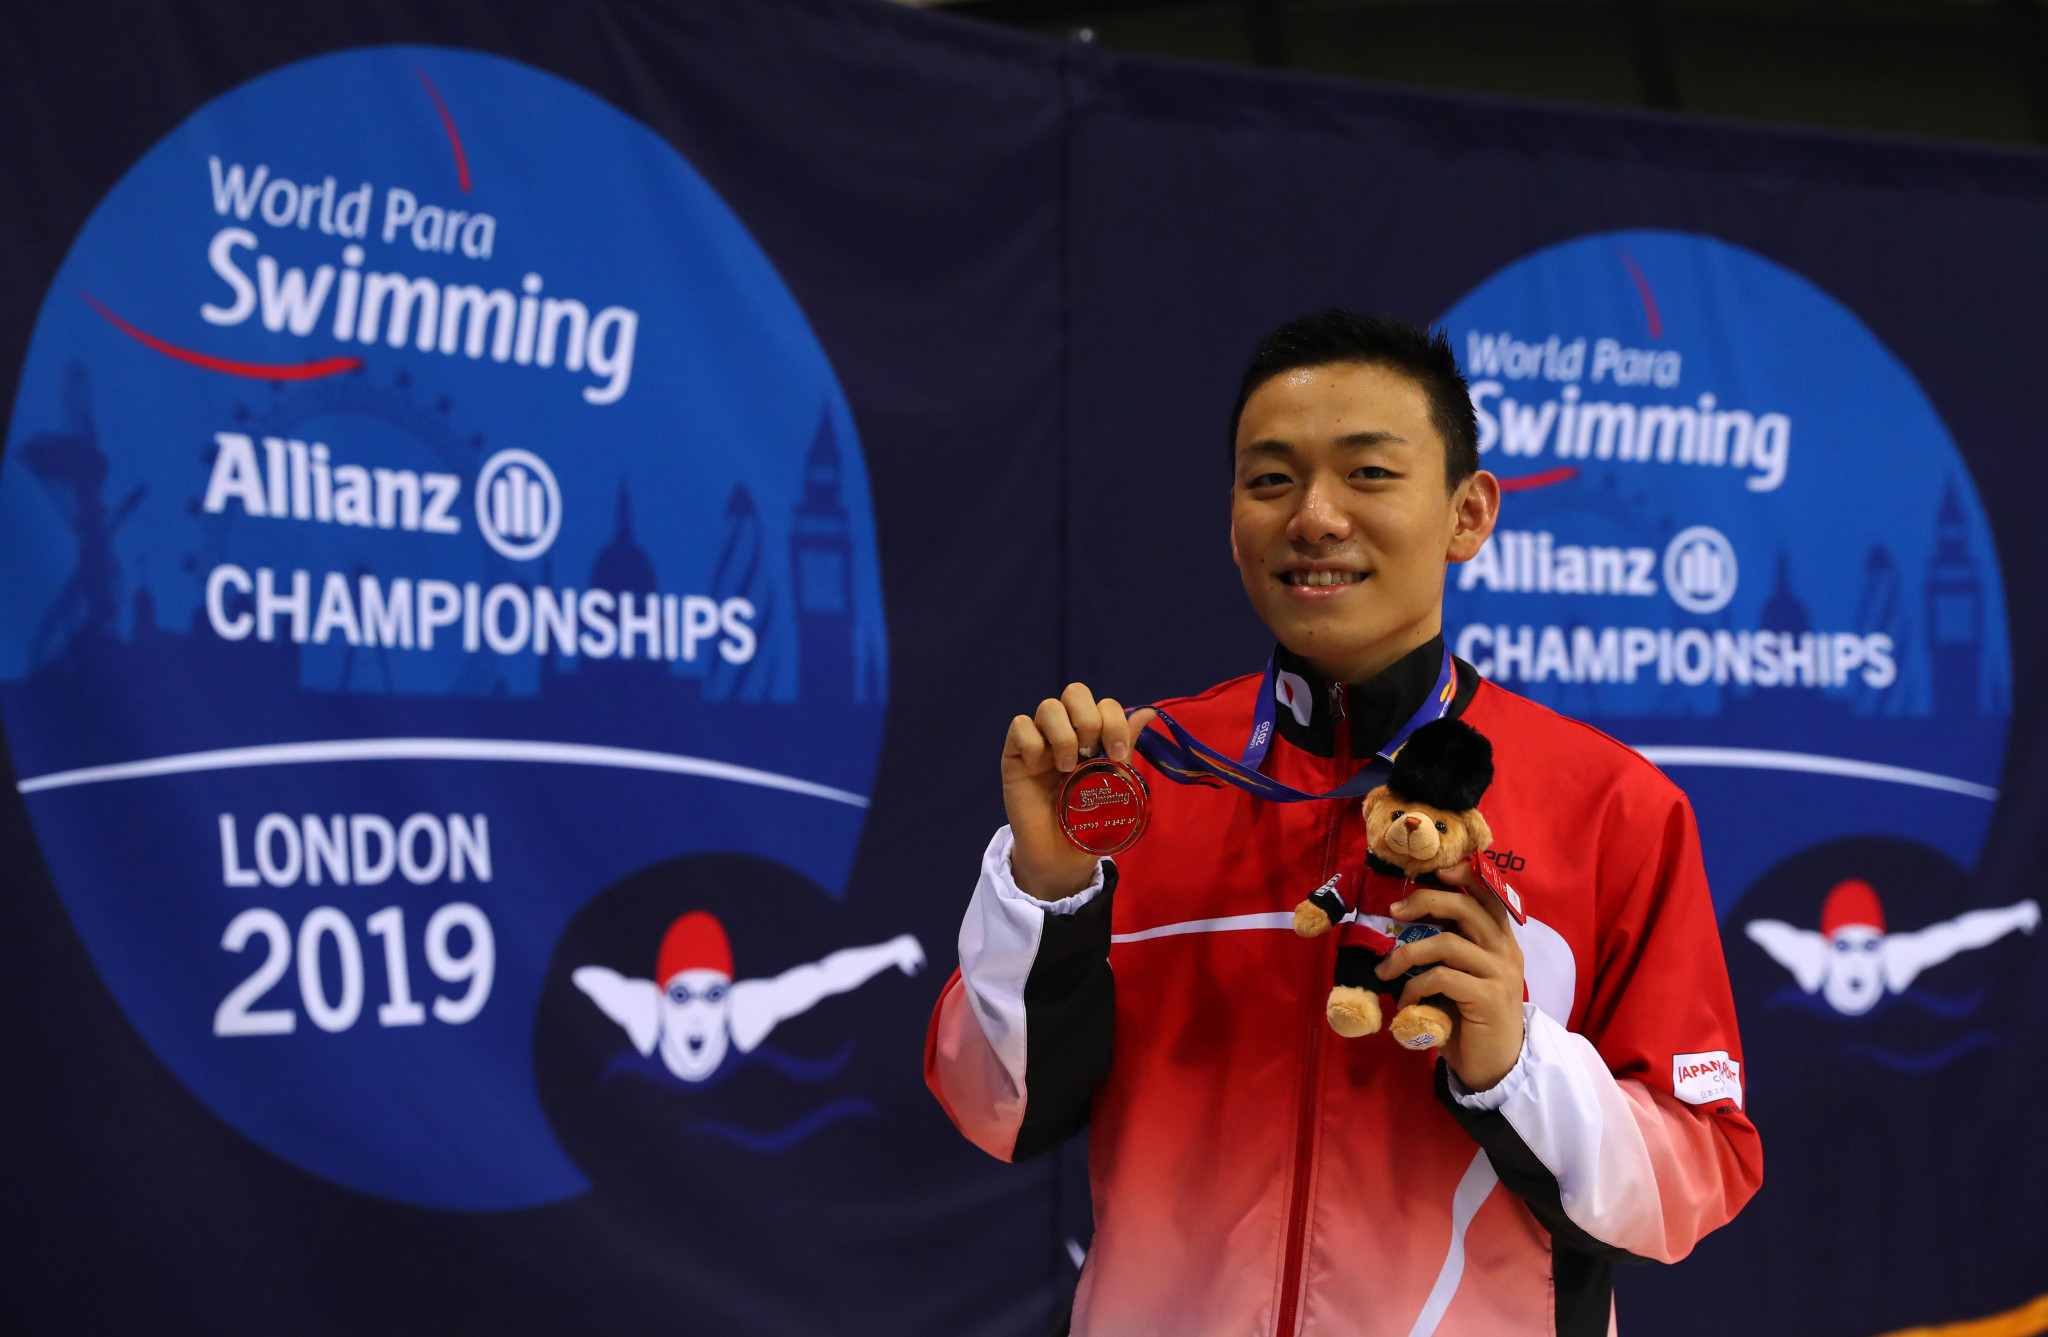 Naohide Yamaguchi won gold at last year's World Para Swimming Championships ©Getty Images